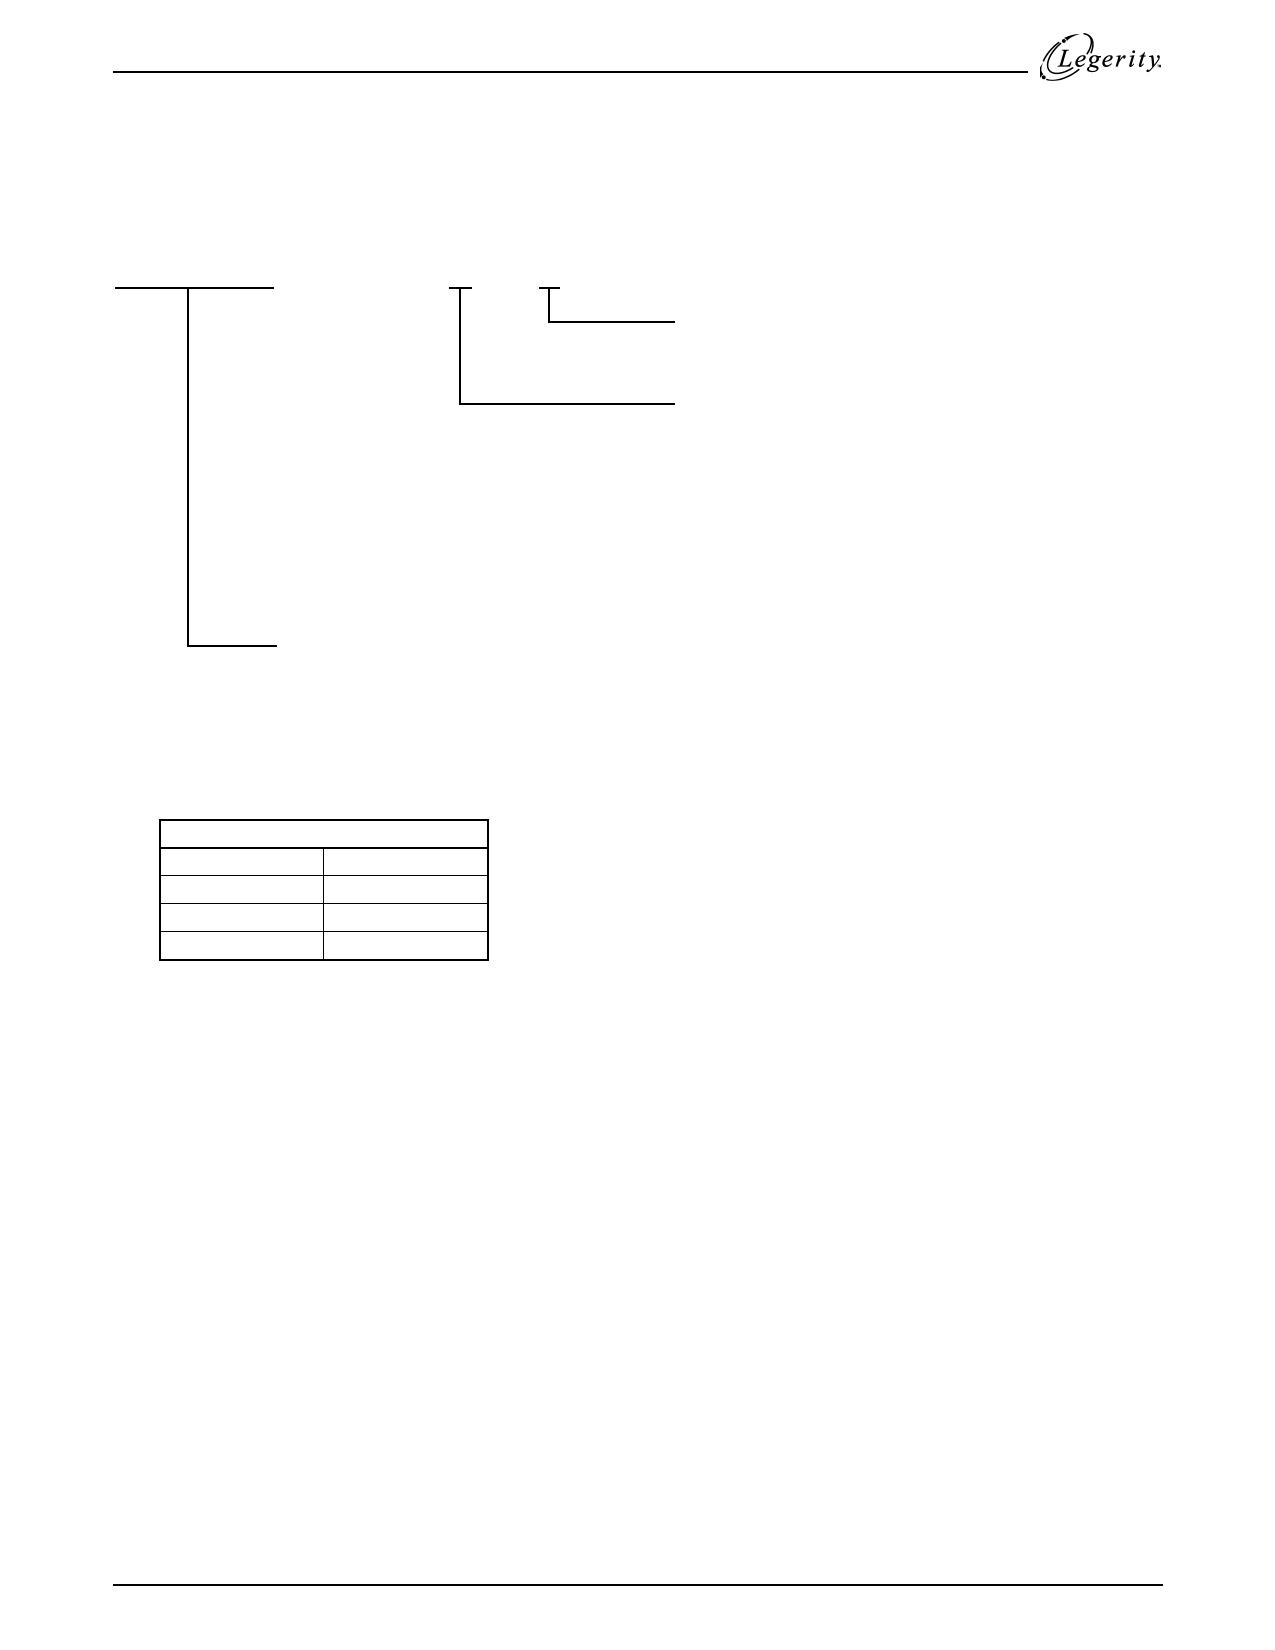 Am79Q02 pdf